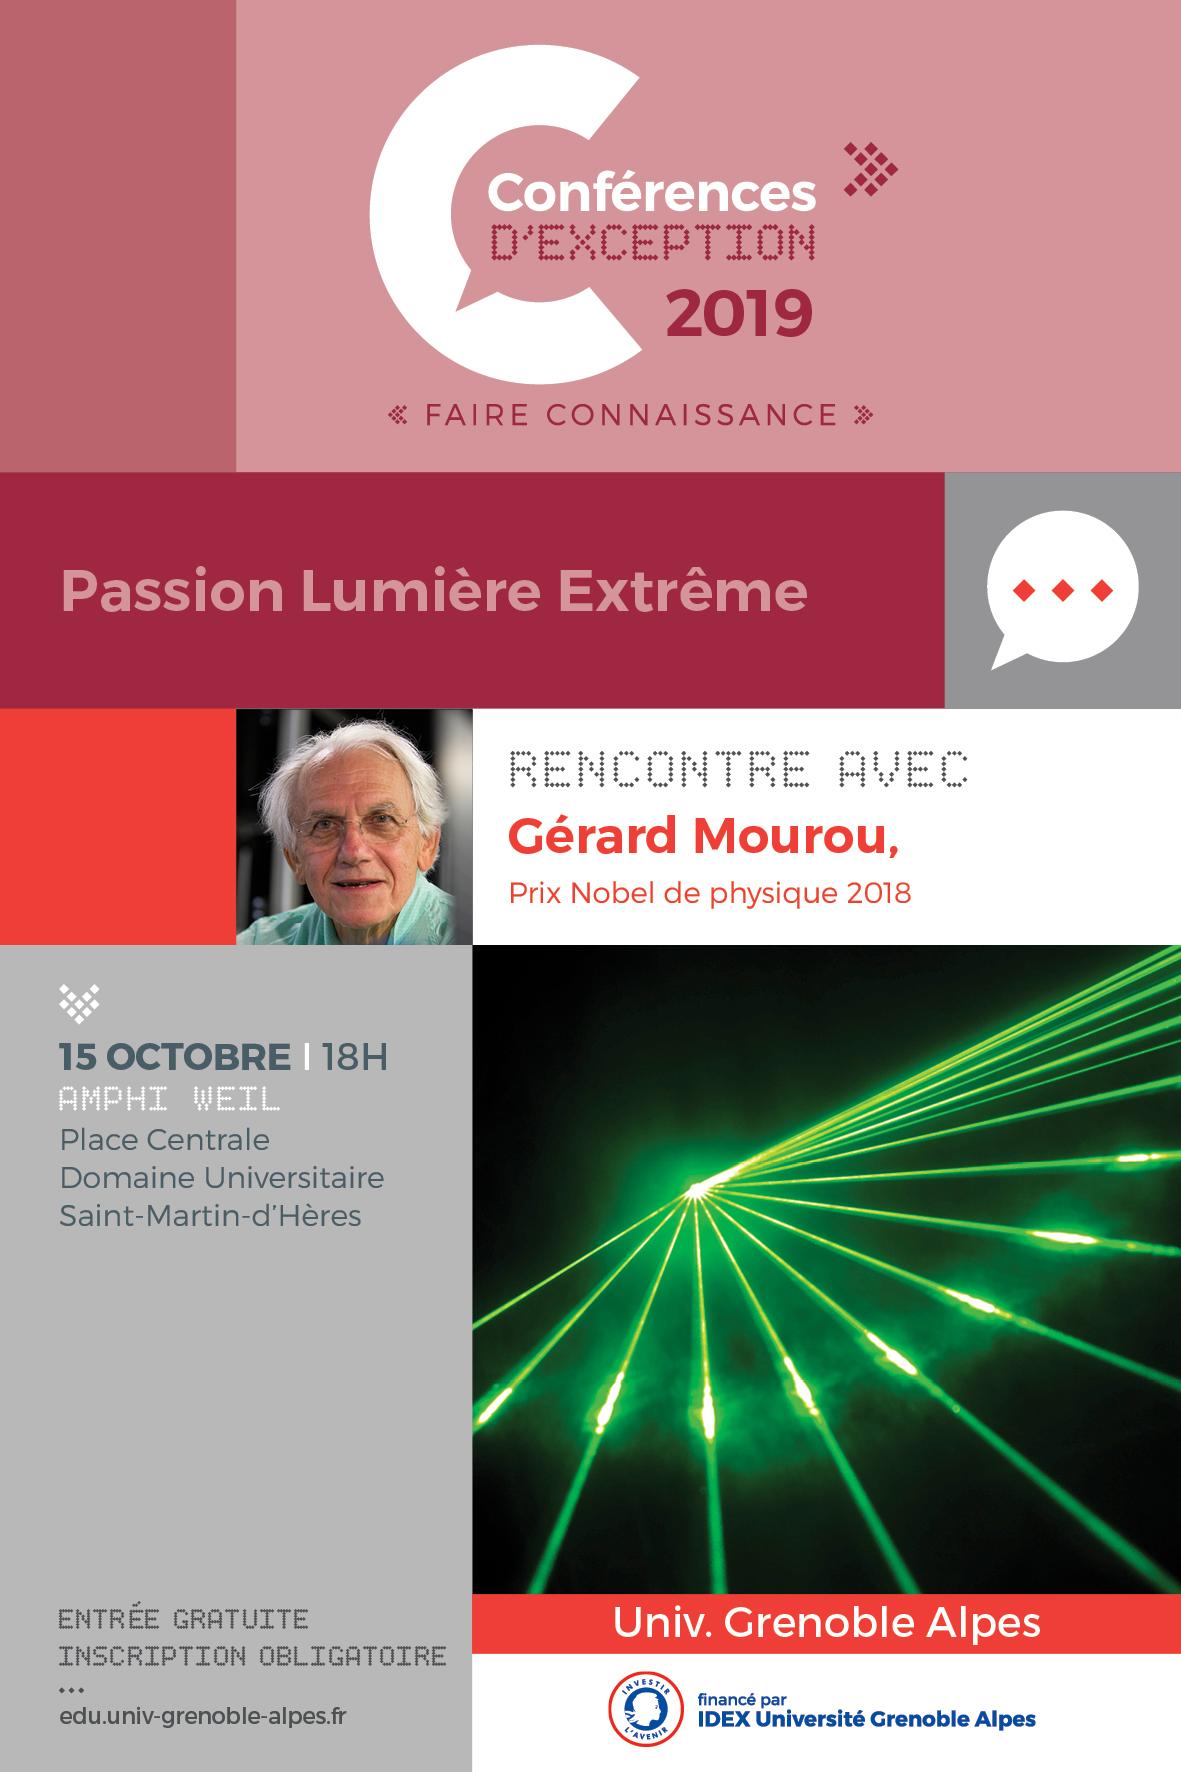 Conférence de Gérard Mourou